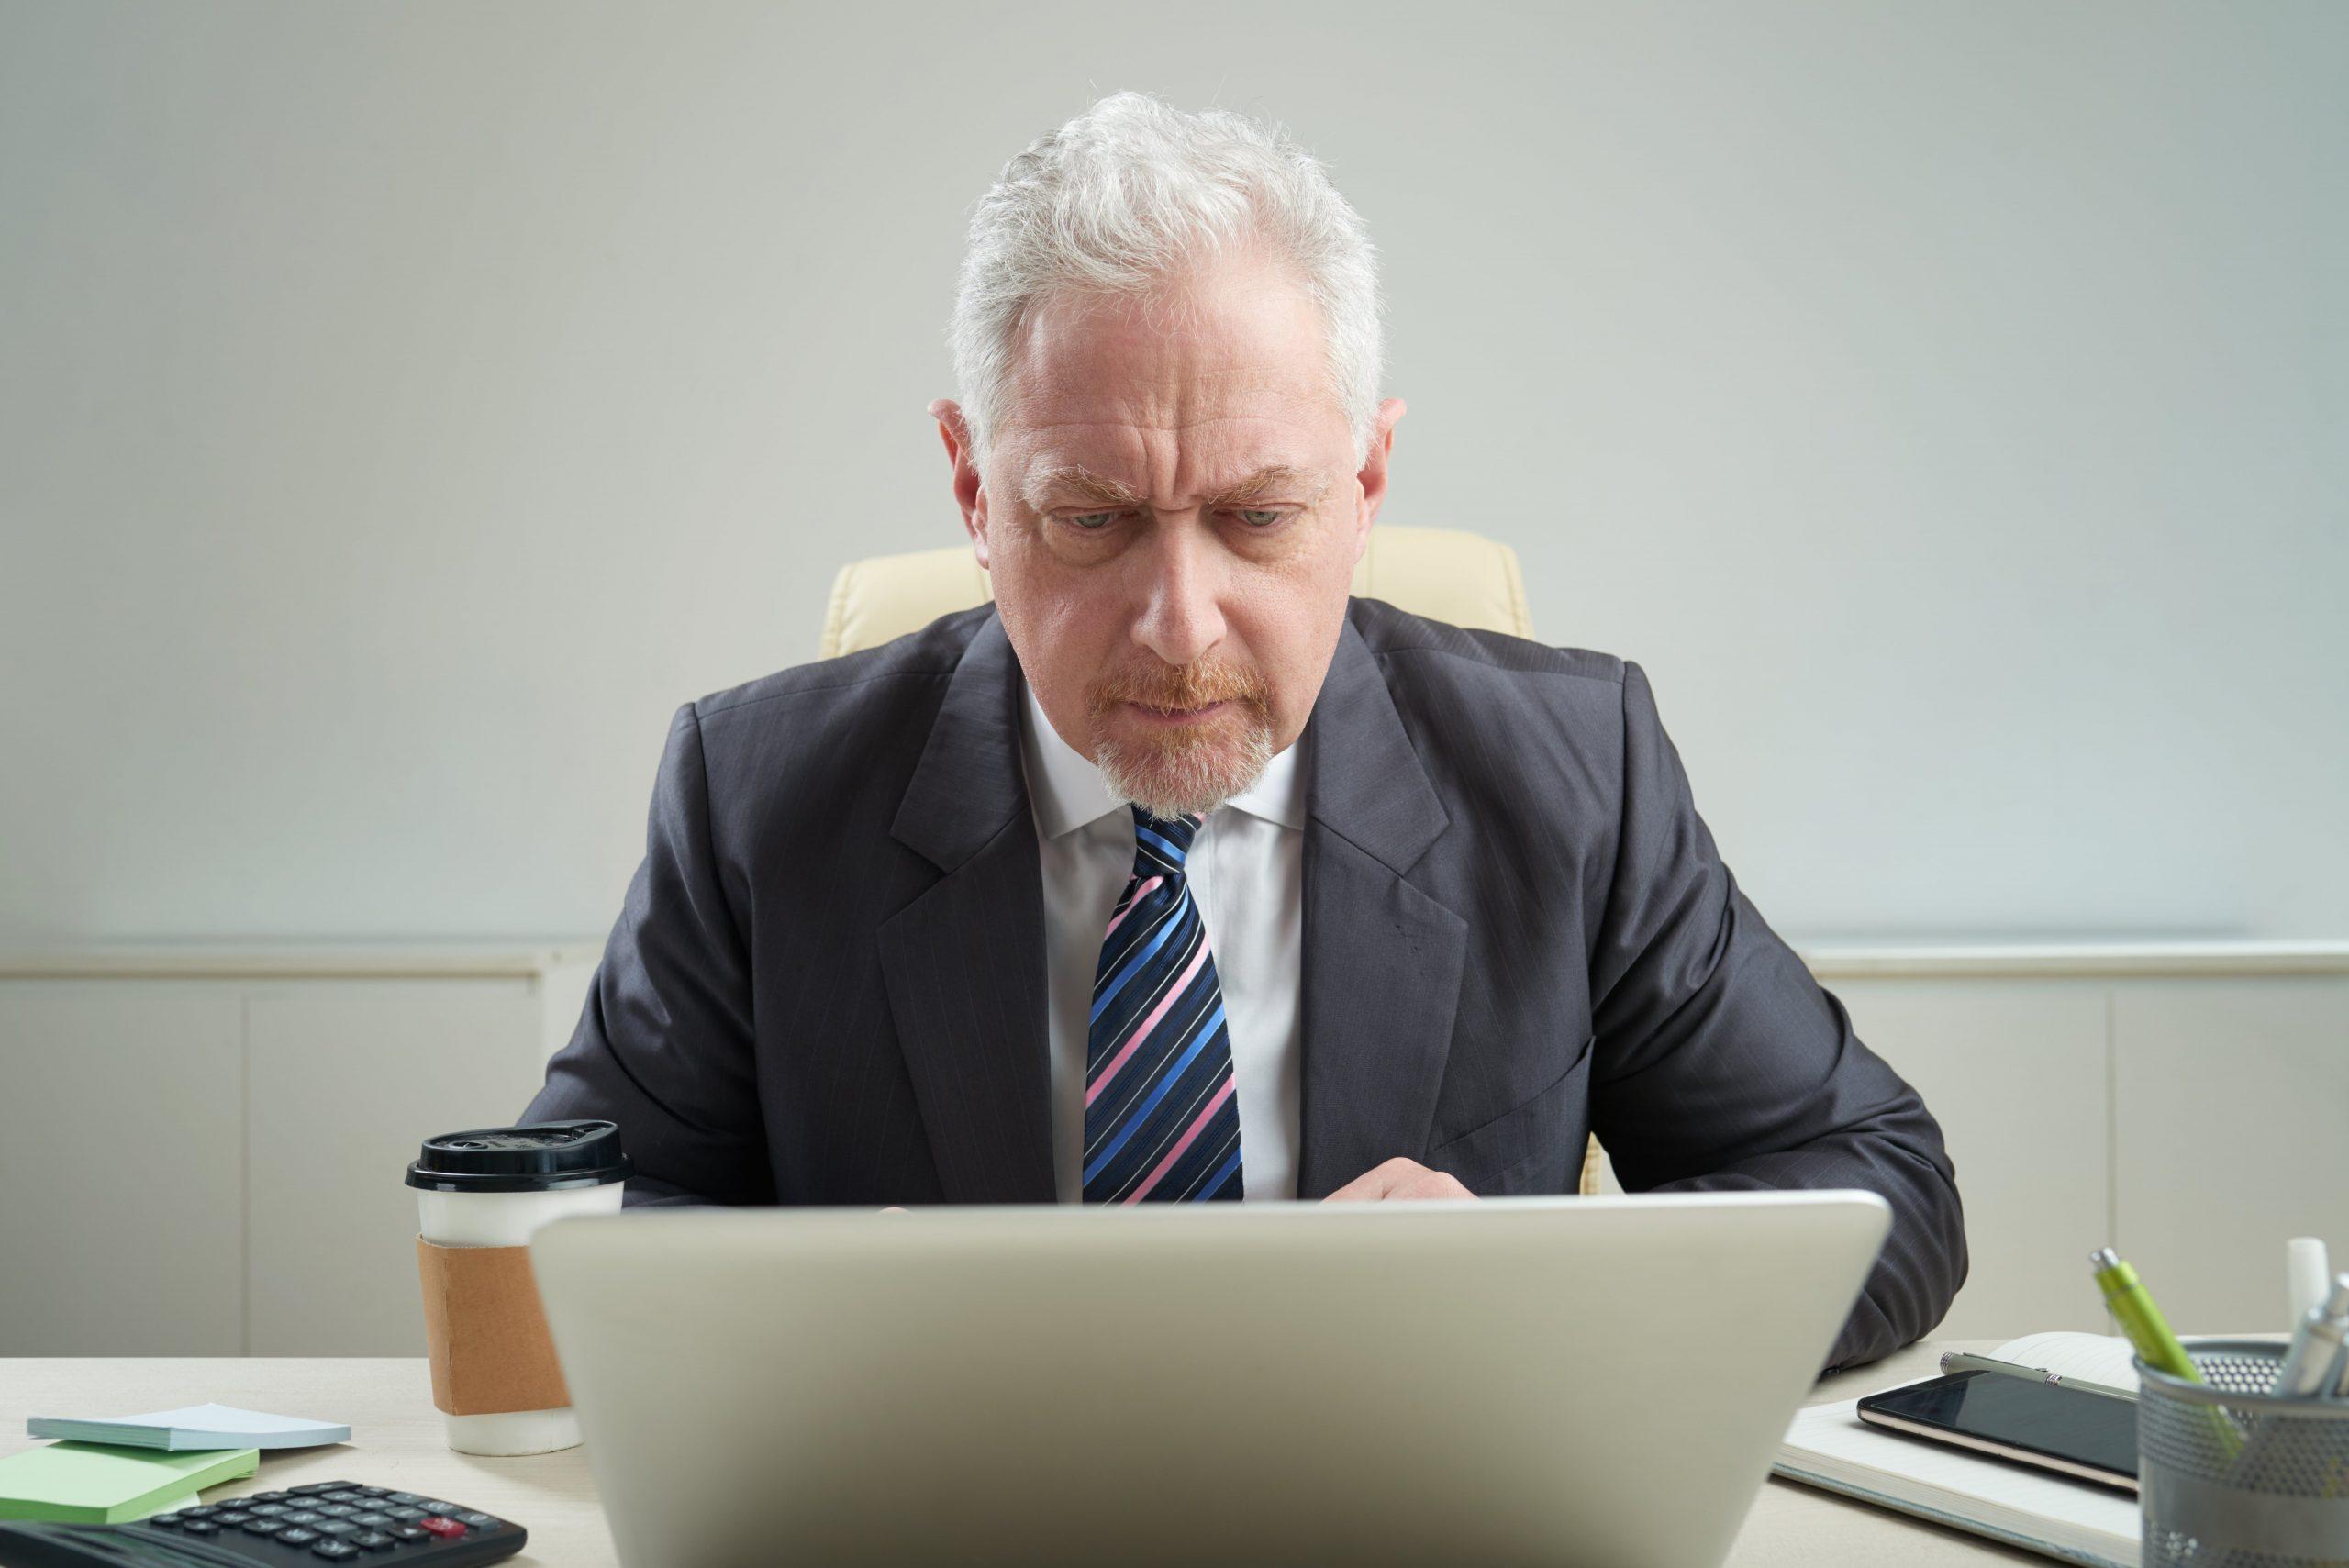 senior-businessman-at-workplace-ZTJZ7ET-min